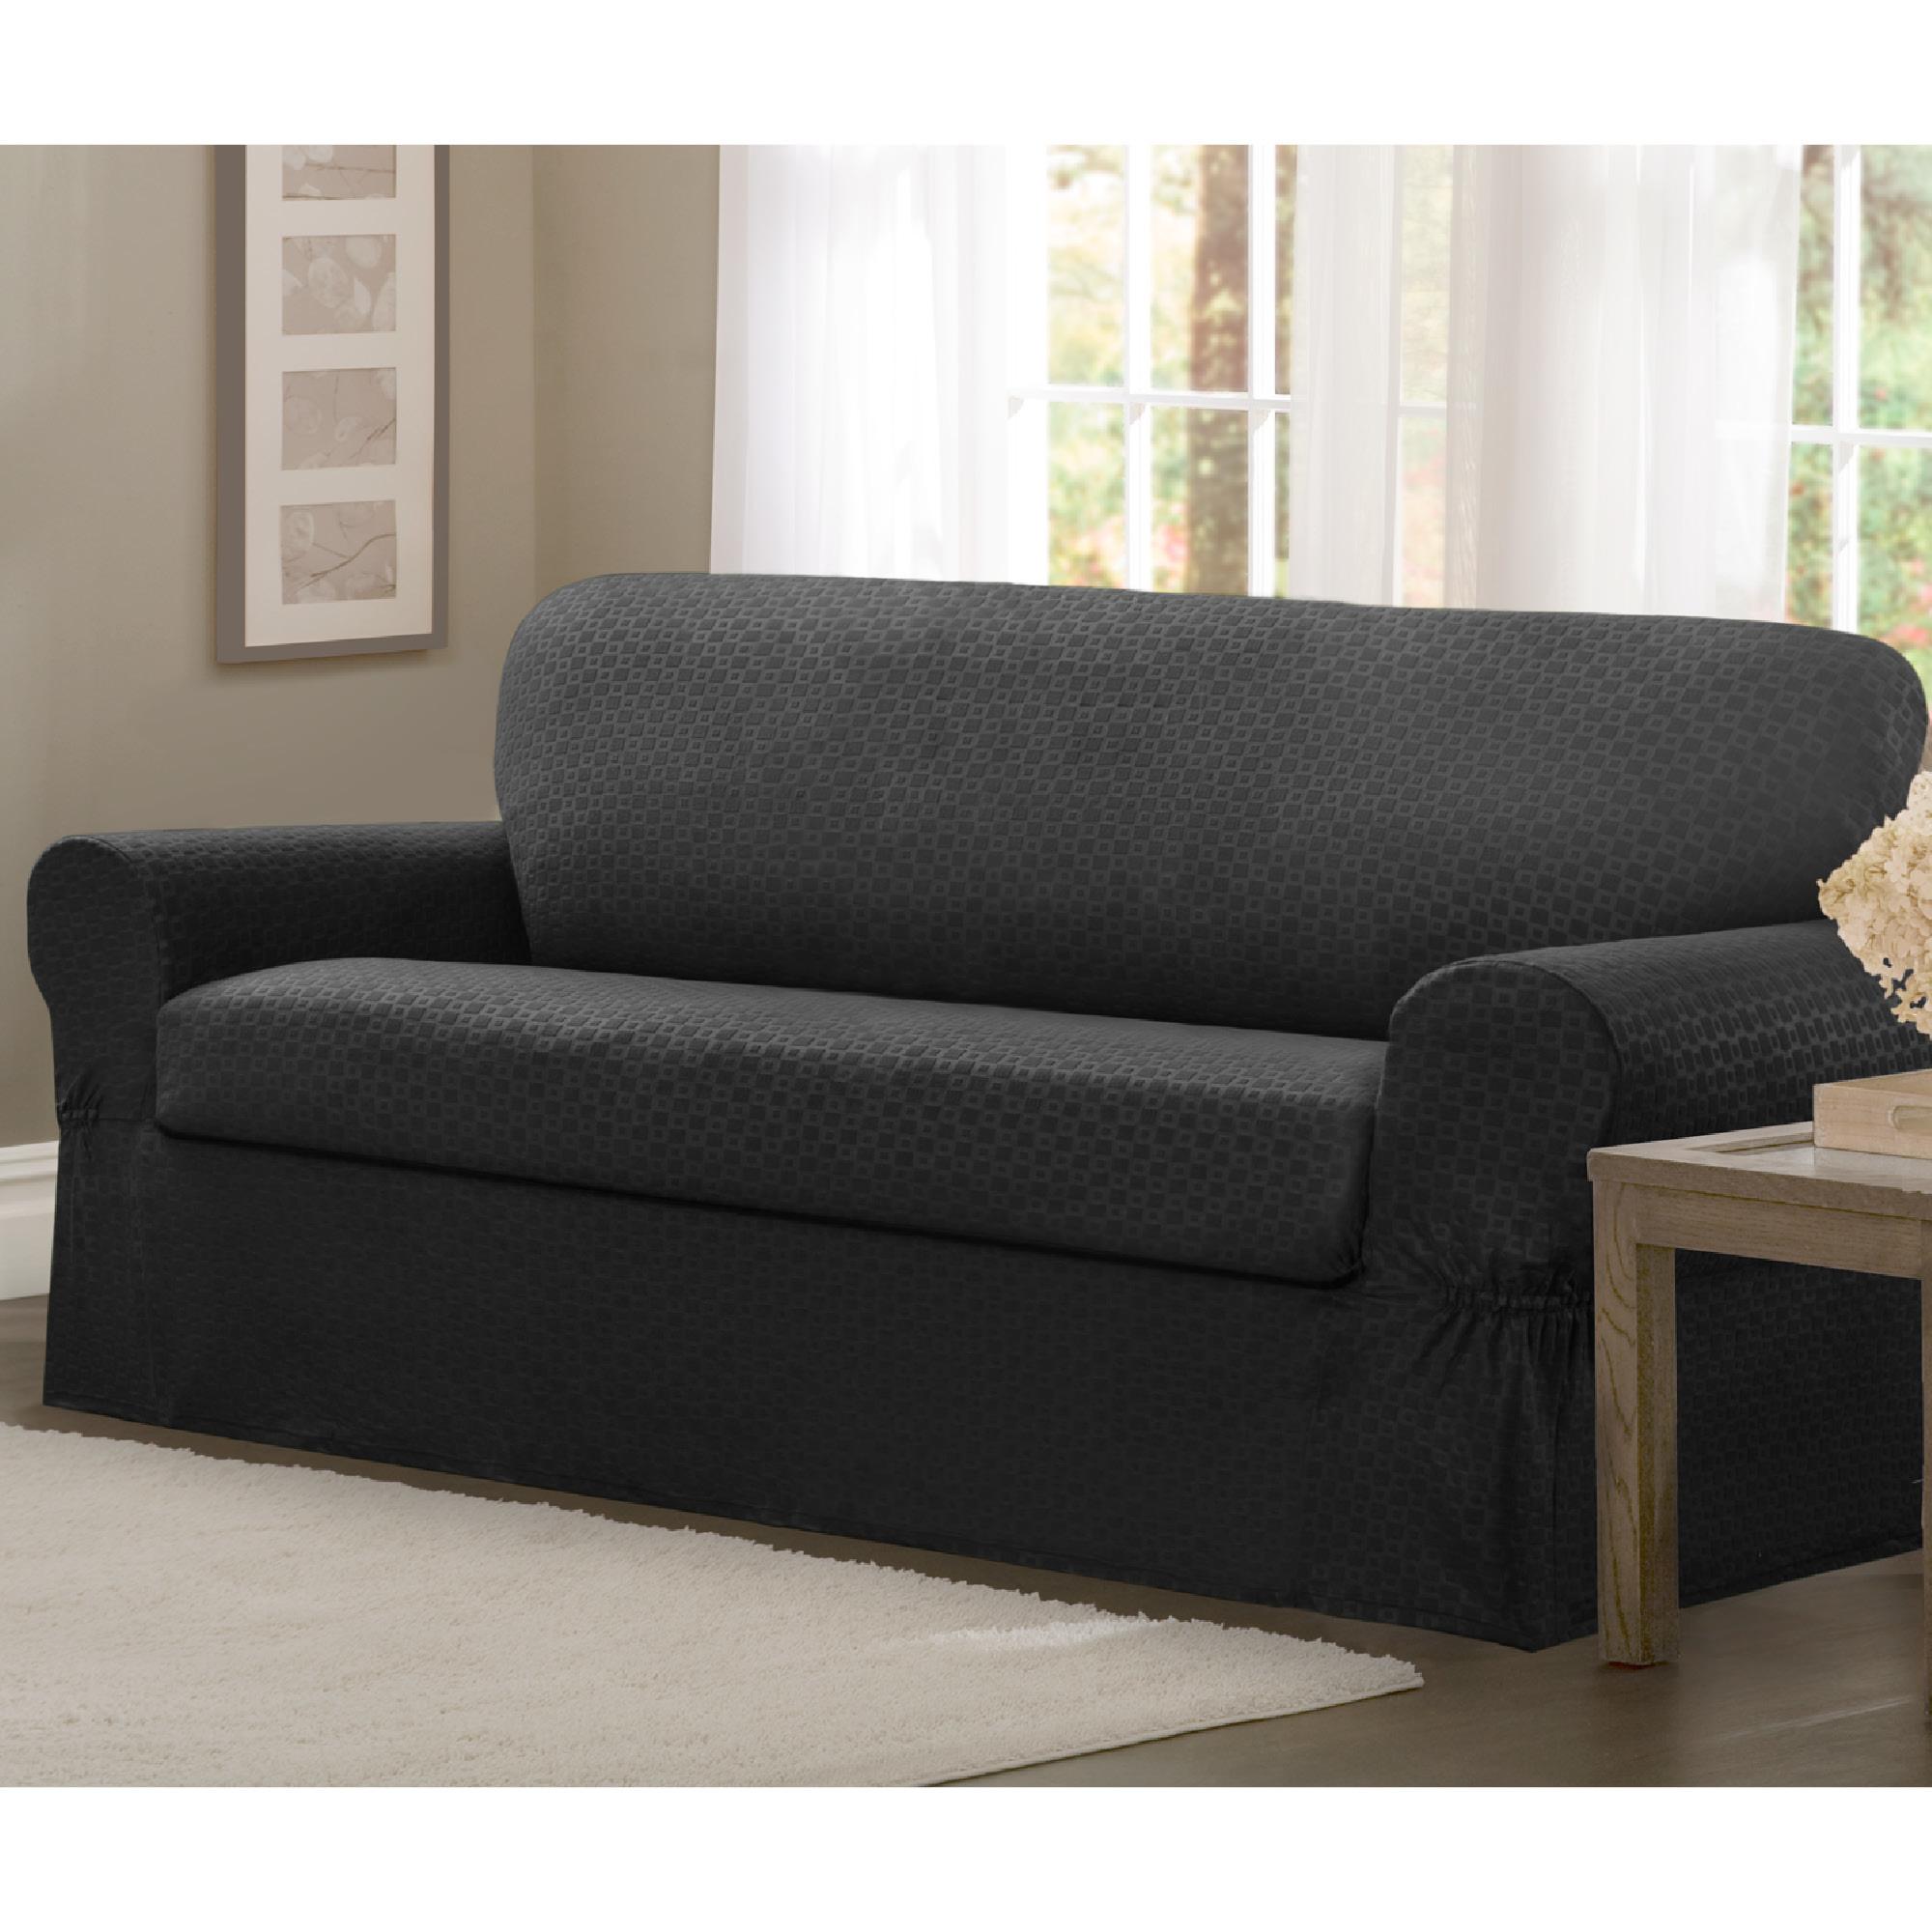 Ethan Allen Slipcovers   Ethan Allen Leather Furniture   Ethan Allen Furniture Reviews